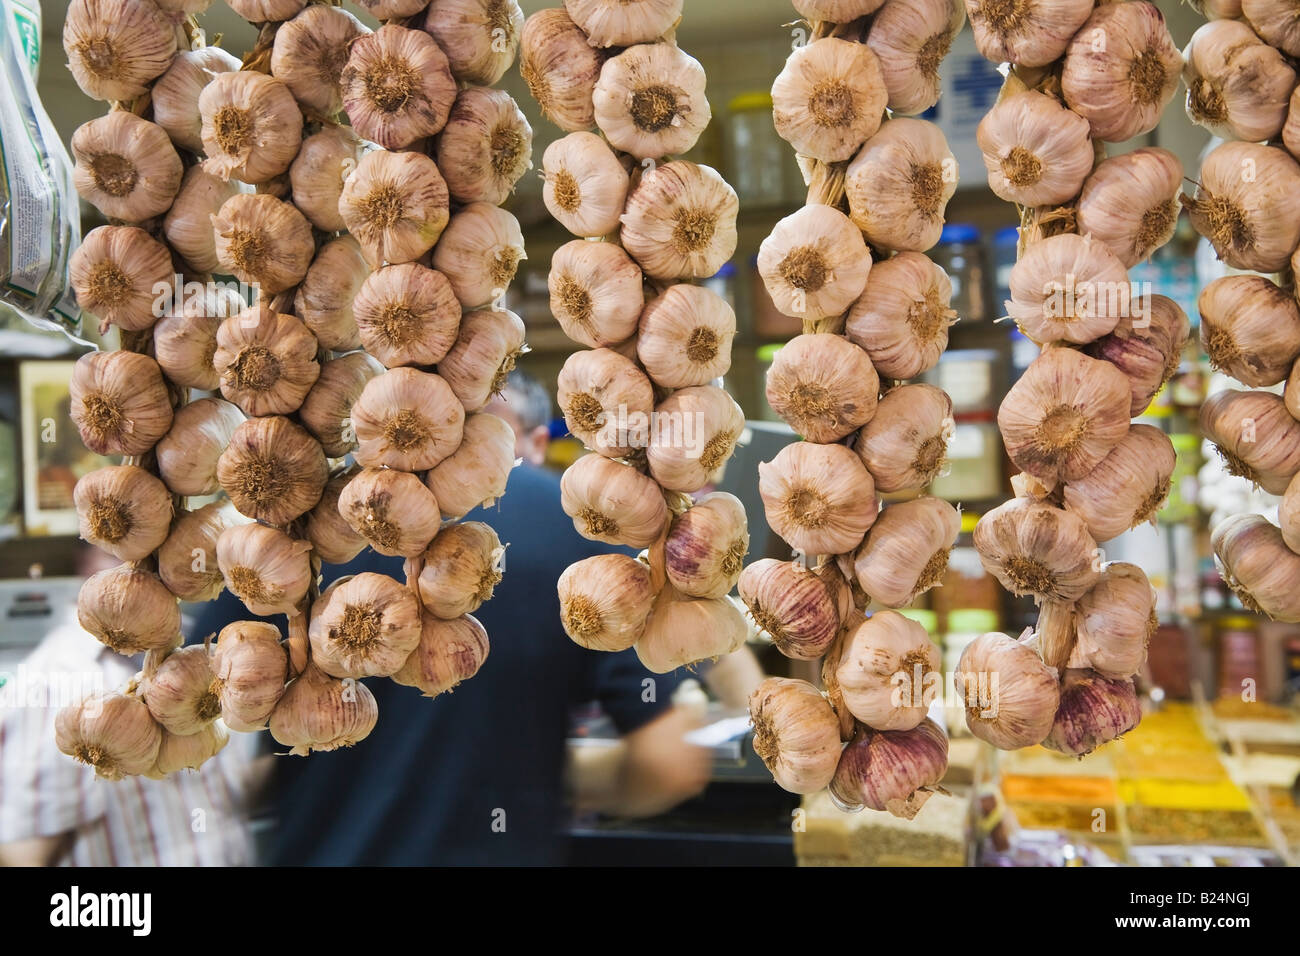 Strings of garlic in market Spain - Stock Image